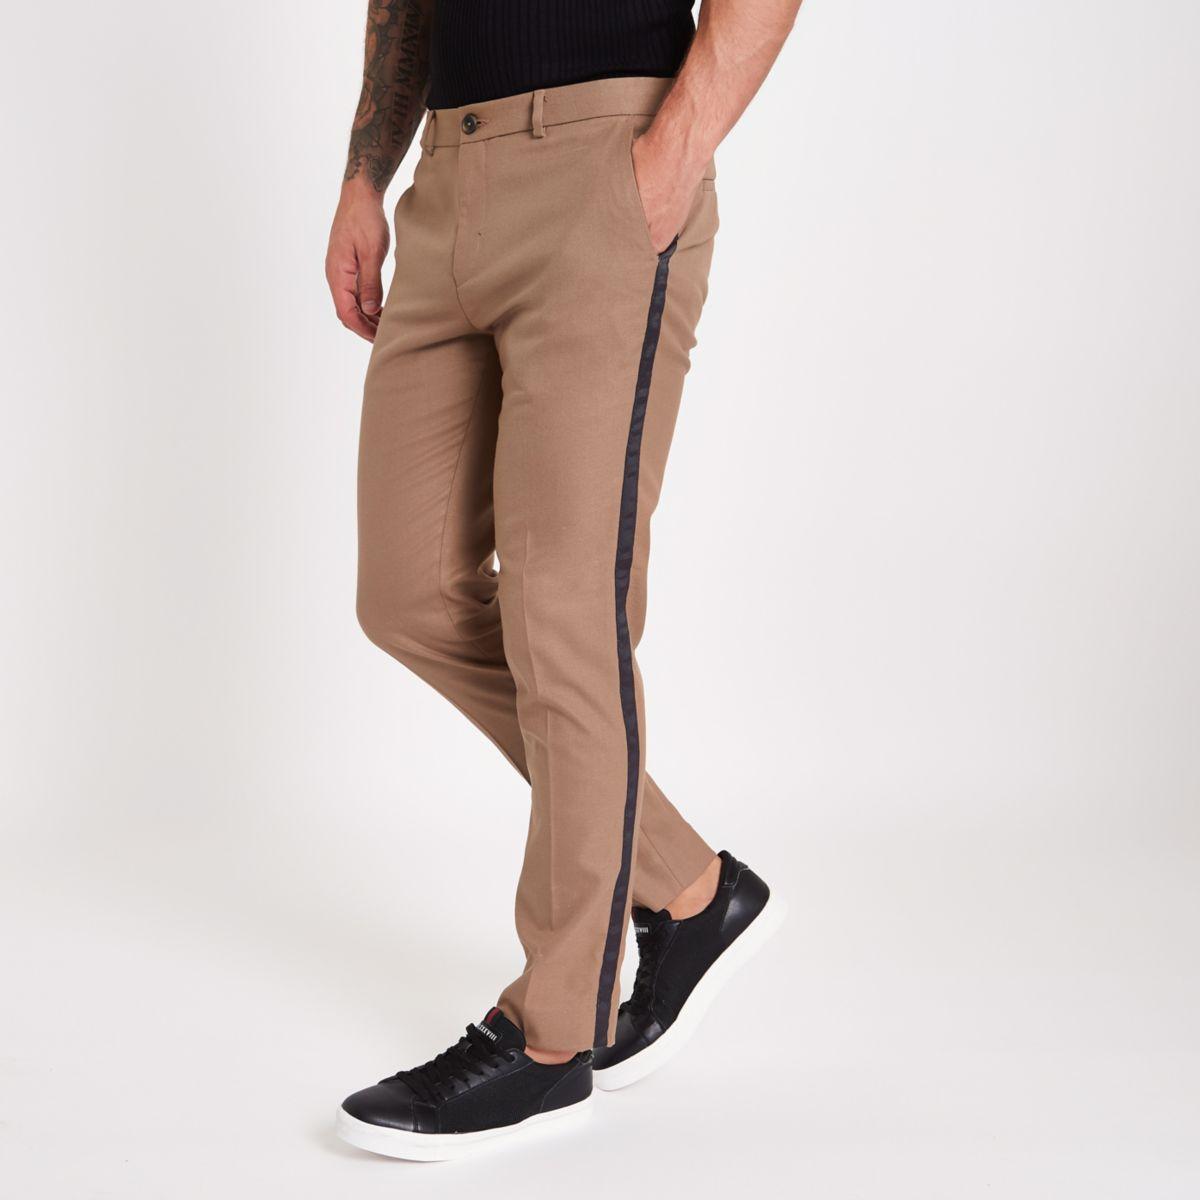 pantalon skinny marron avec bande lat rale pantalons habill s pantalons homme. Black Bedroom Furniture Sets. Home Design Ideas